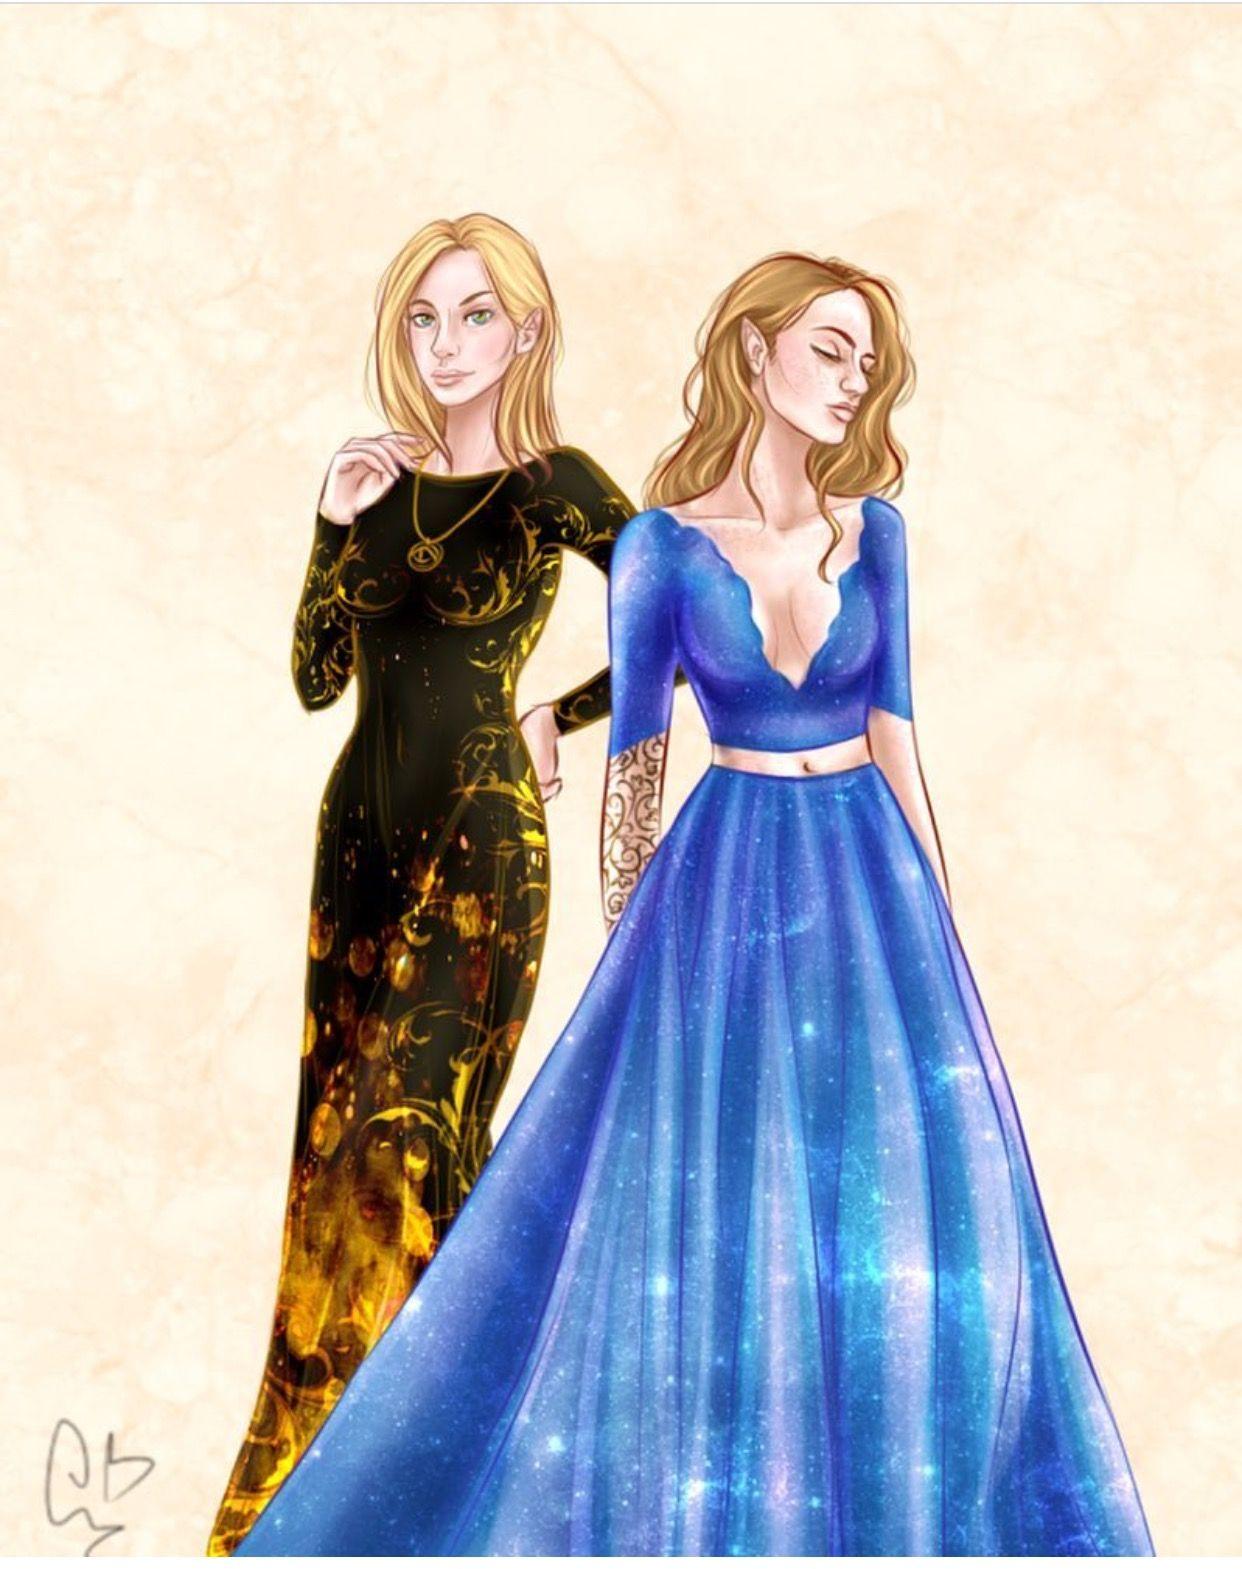 Aelins dragon dress and Feyres Starfall dress